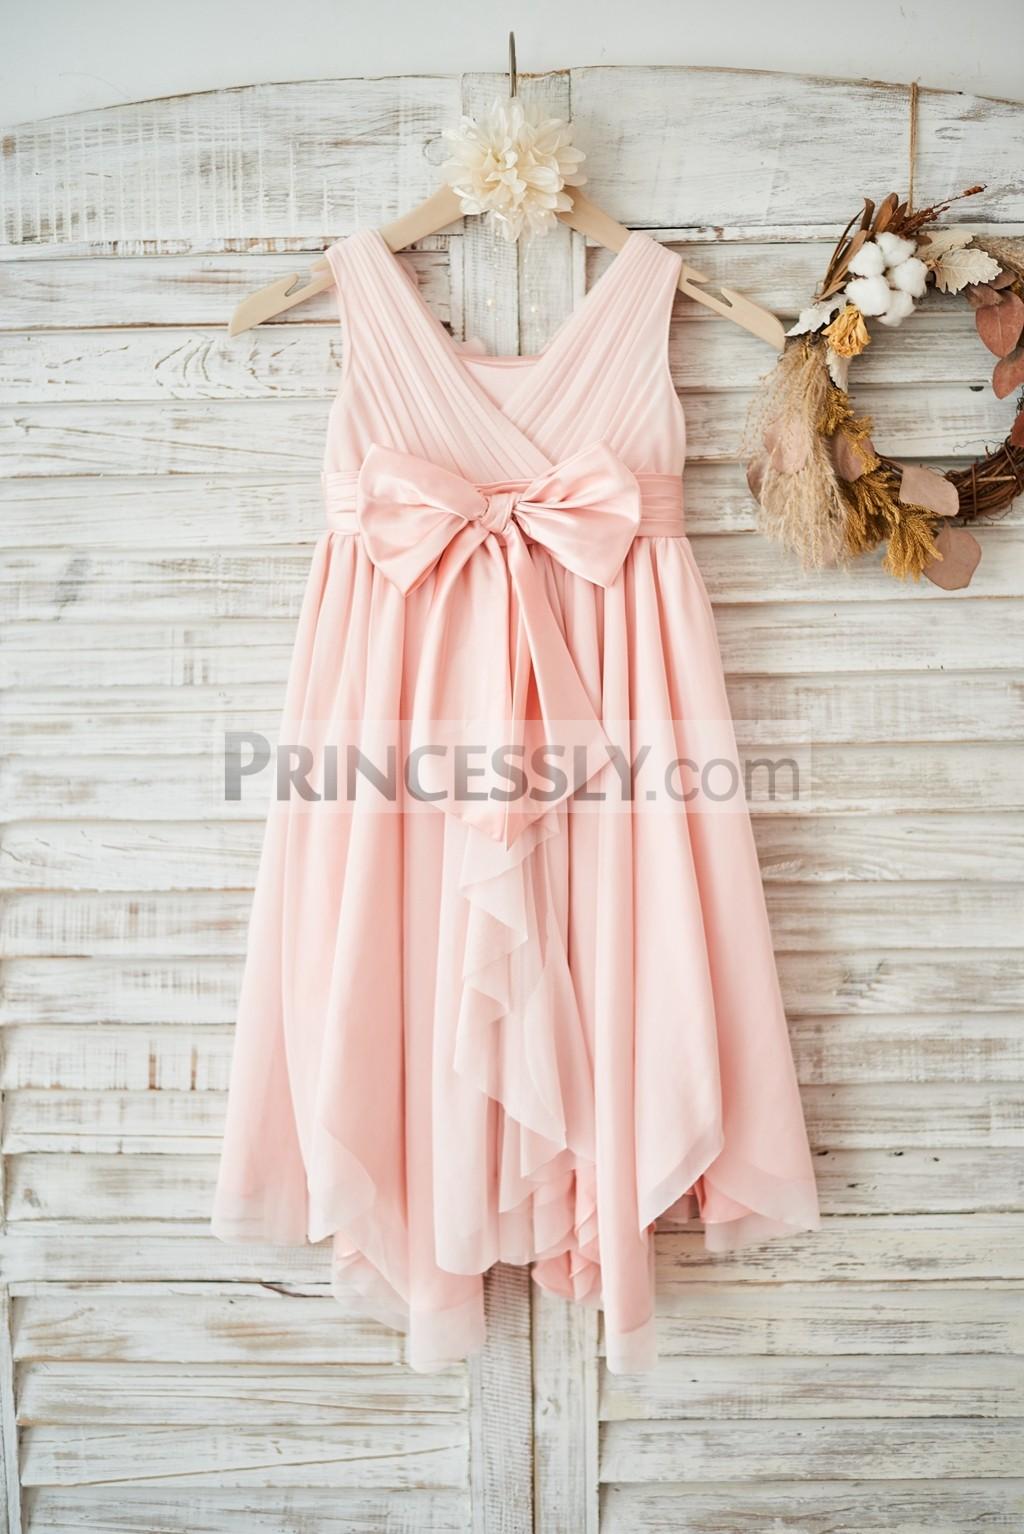 Blush Pink Tulle Ruffles Back Uneven Skirt Hem Wedding Little Girl Dress